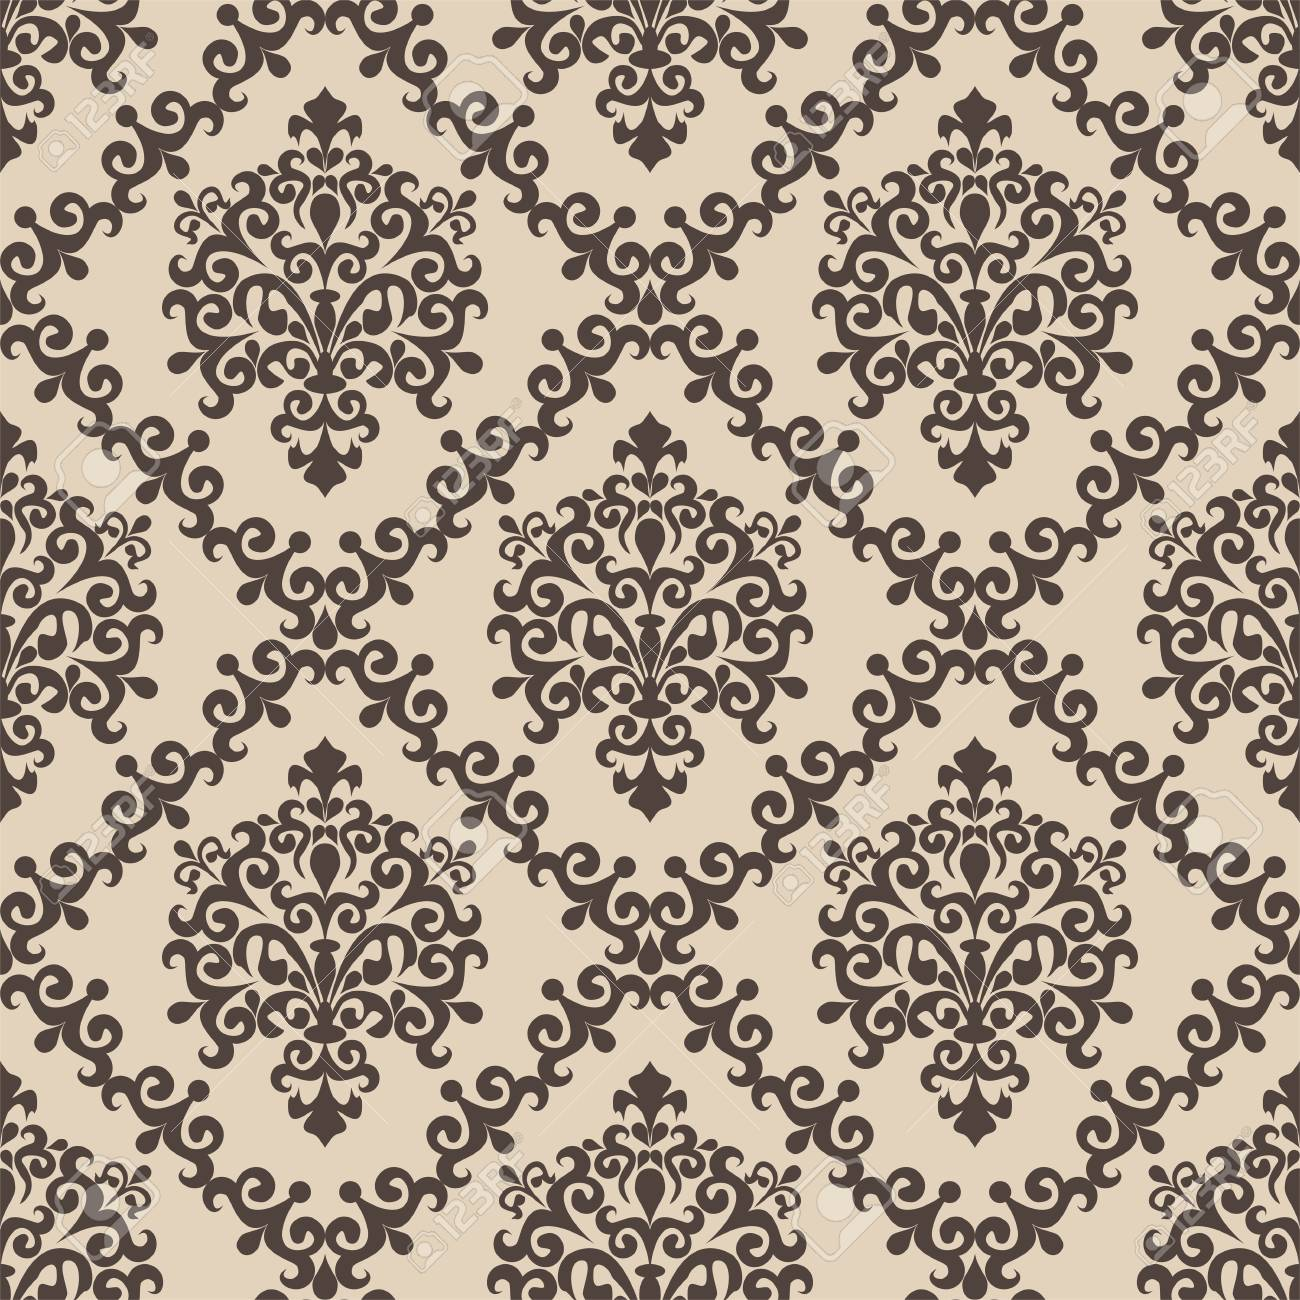 Seamless damask Pattern for Design - 98385588